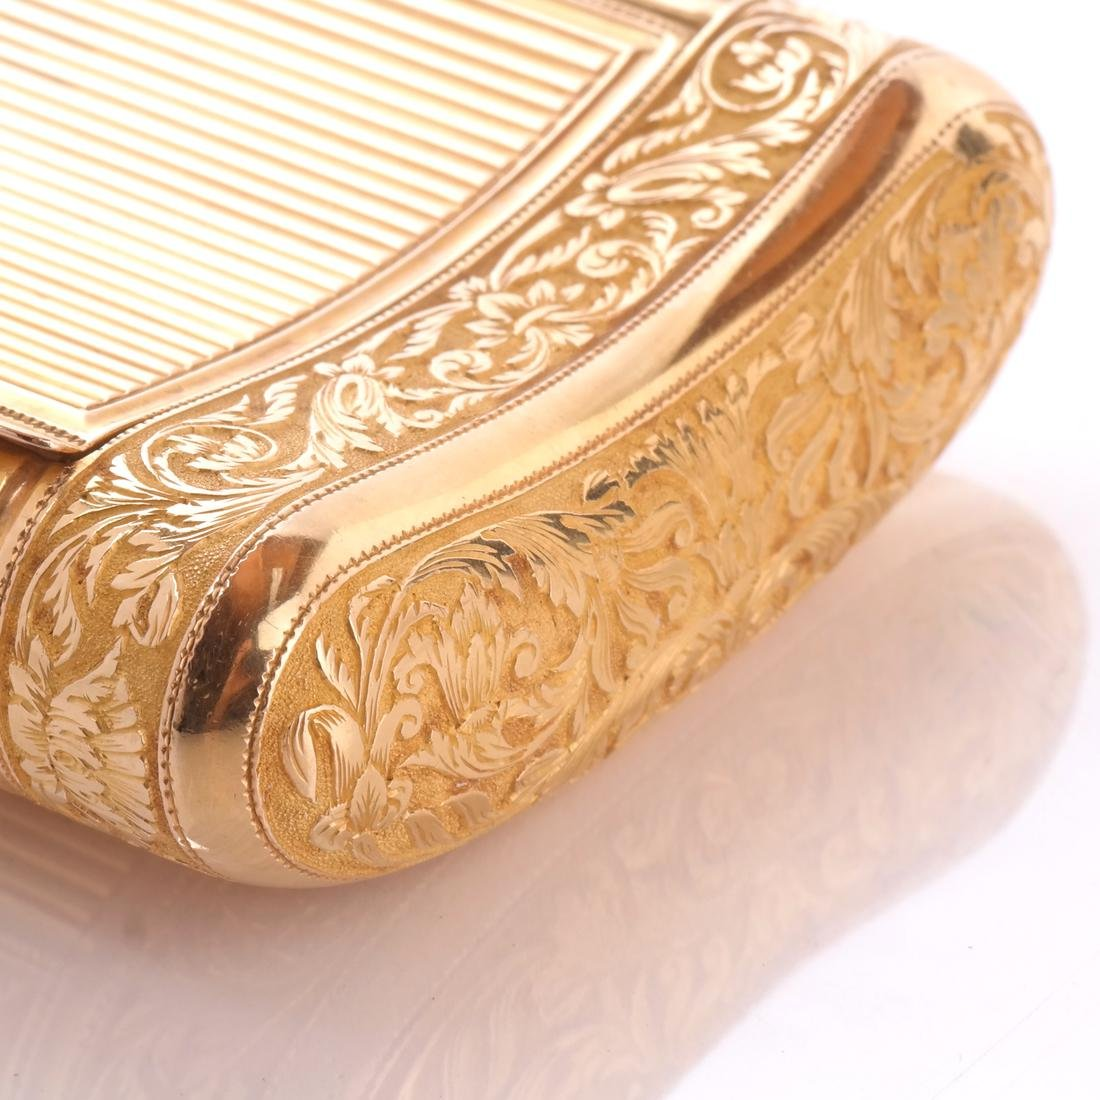 French 18k Gold Snuff Box - 5